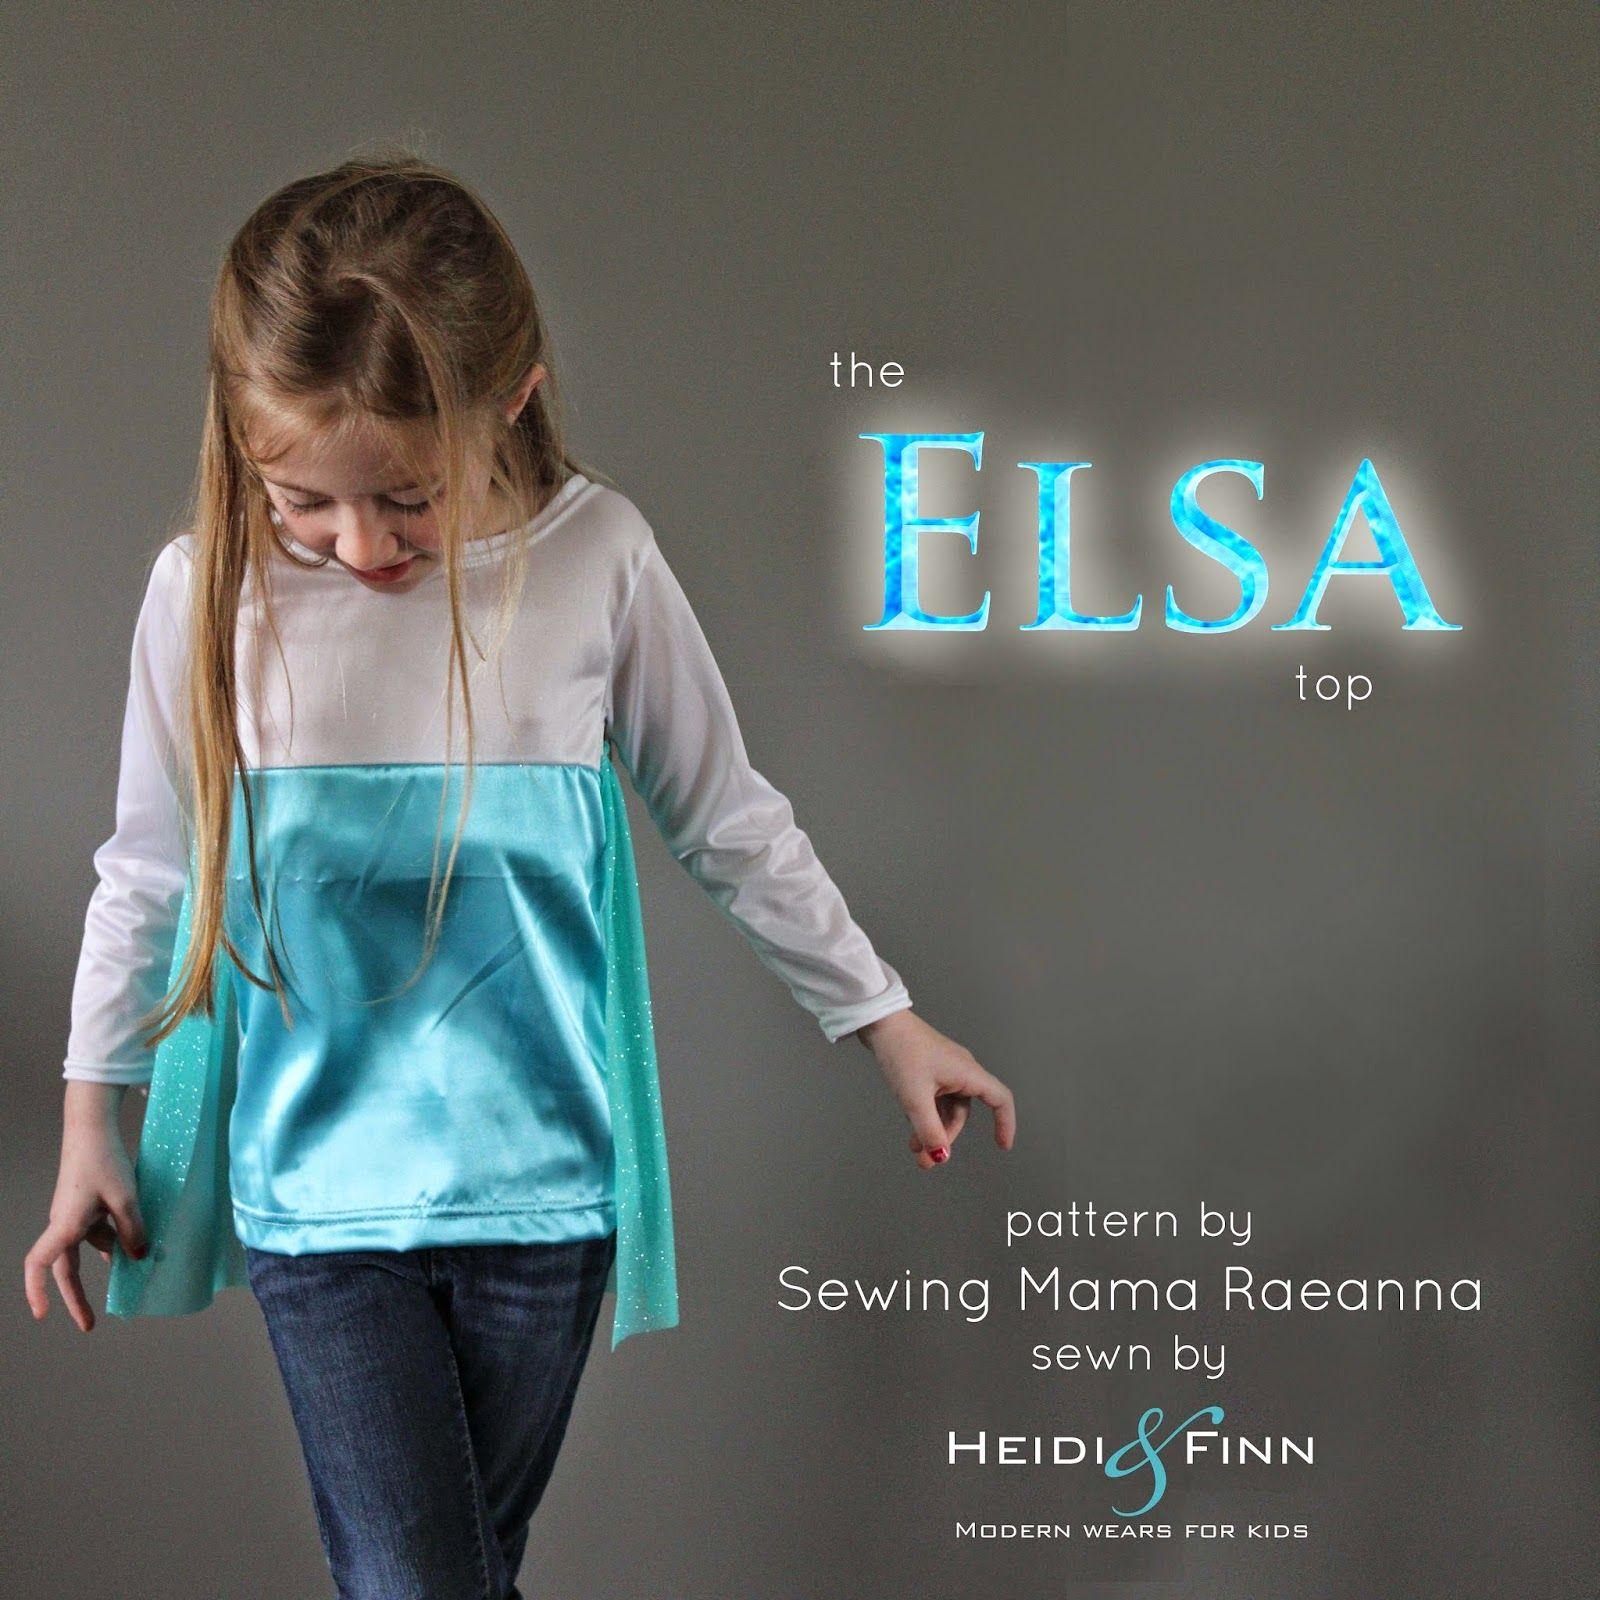 03aae3c9cc8b HeidiandFinn modern wears for kids  Elsa top - cupcake top pattern ...